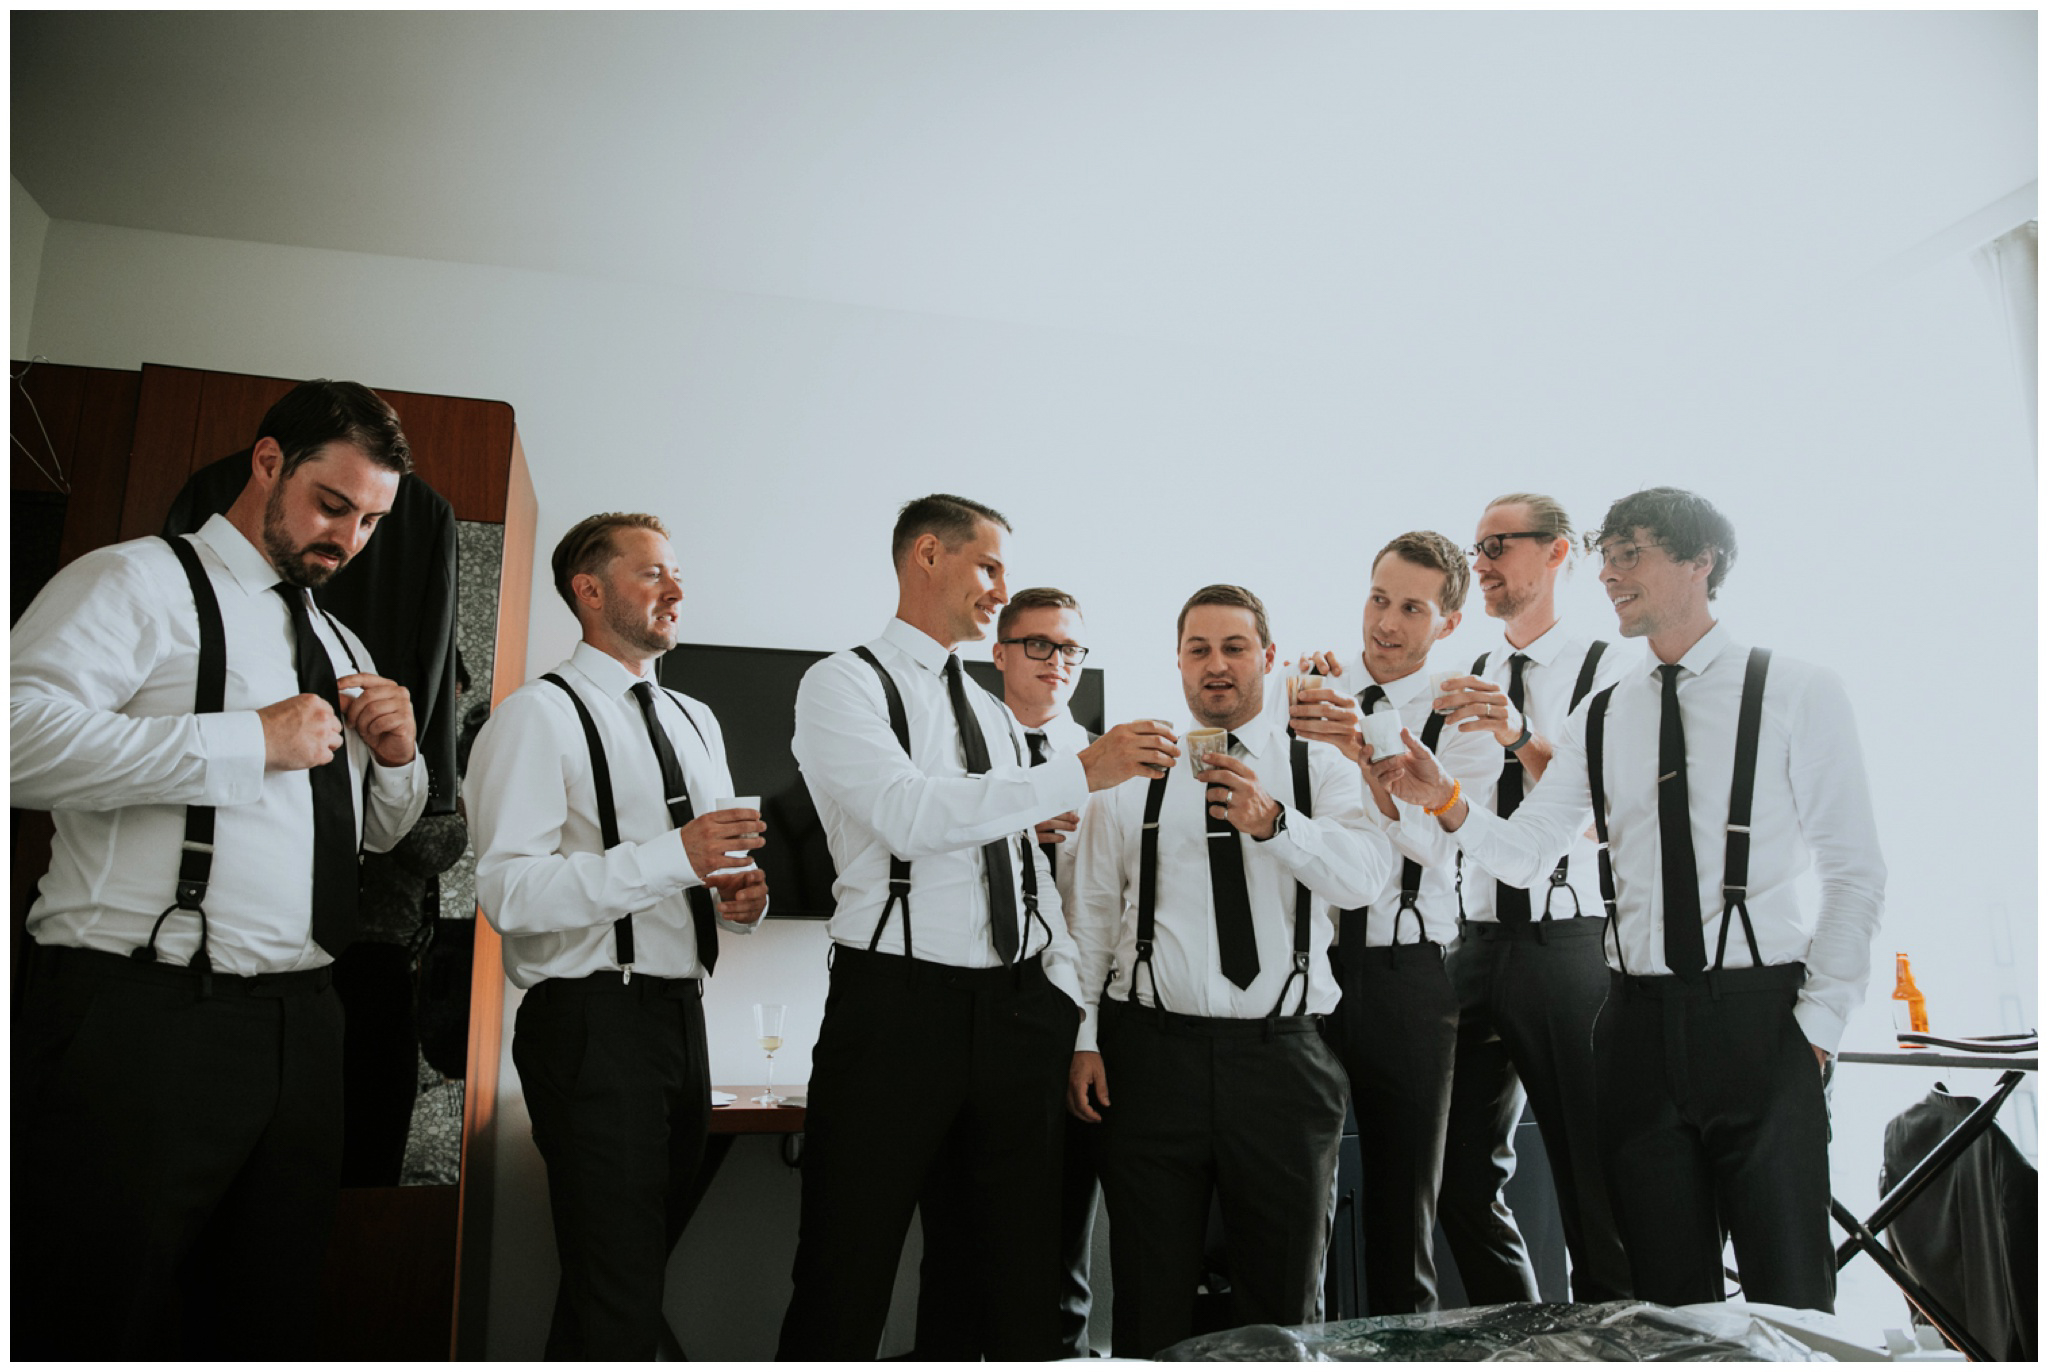 alyssa-keiran-westland-distillery-urban-seattle-wedding-photographer-caitlyn-nikula-9.jpg